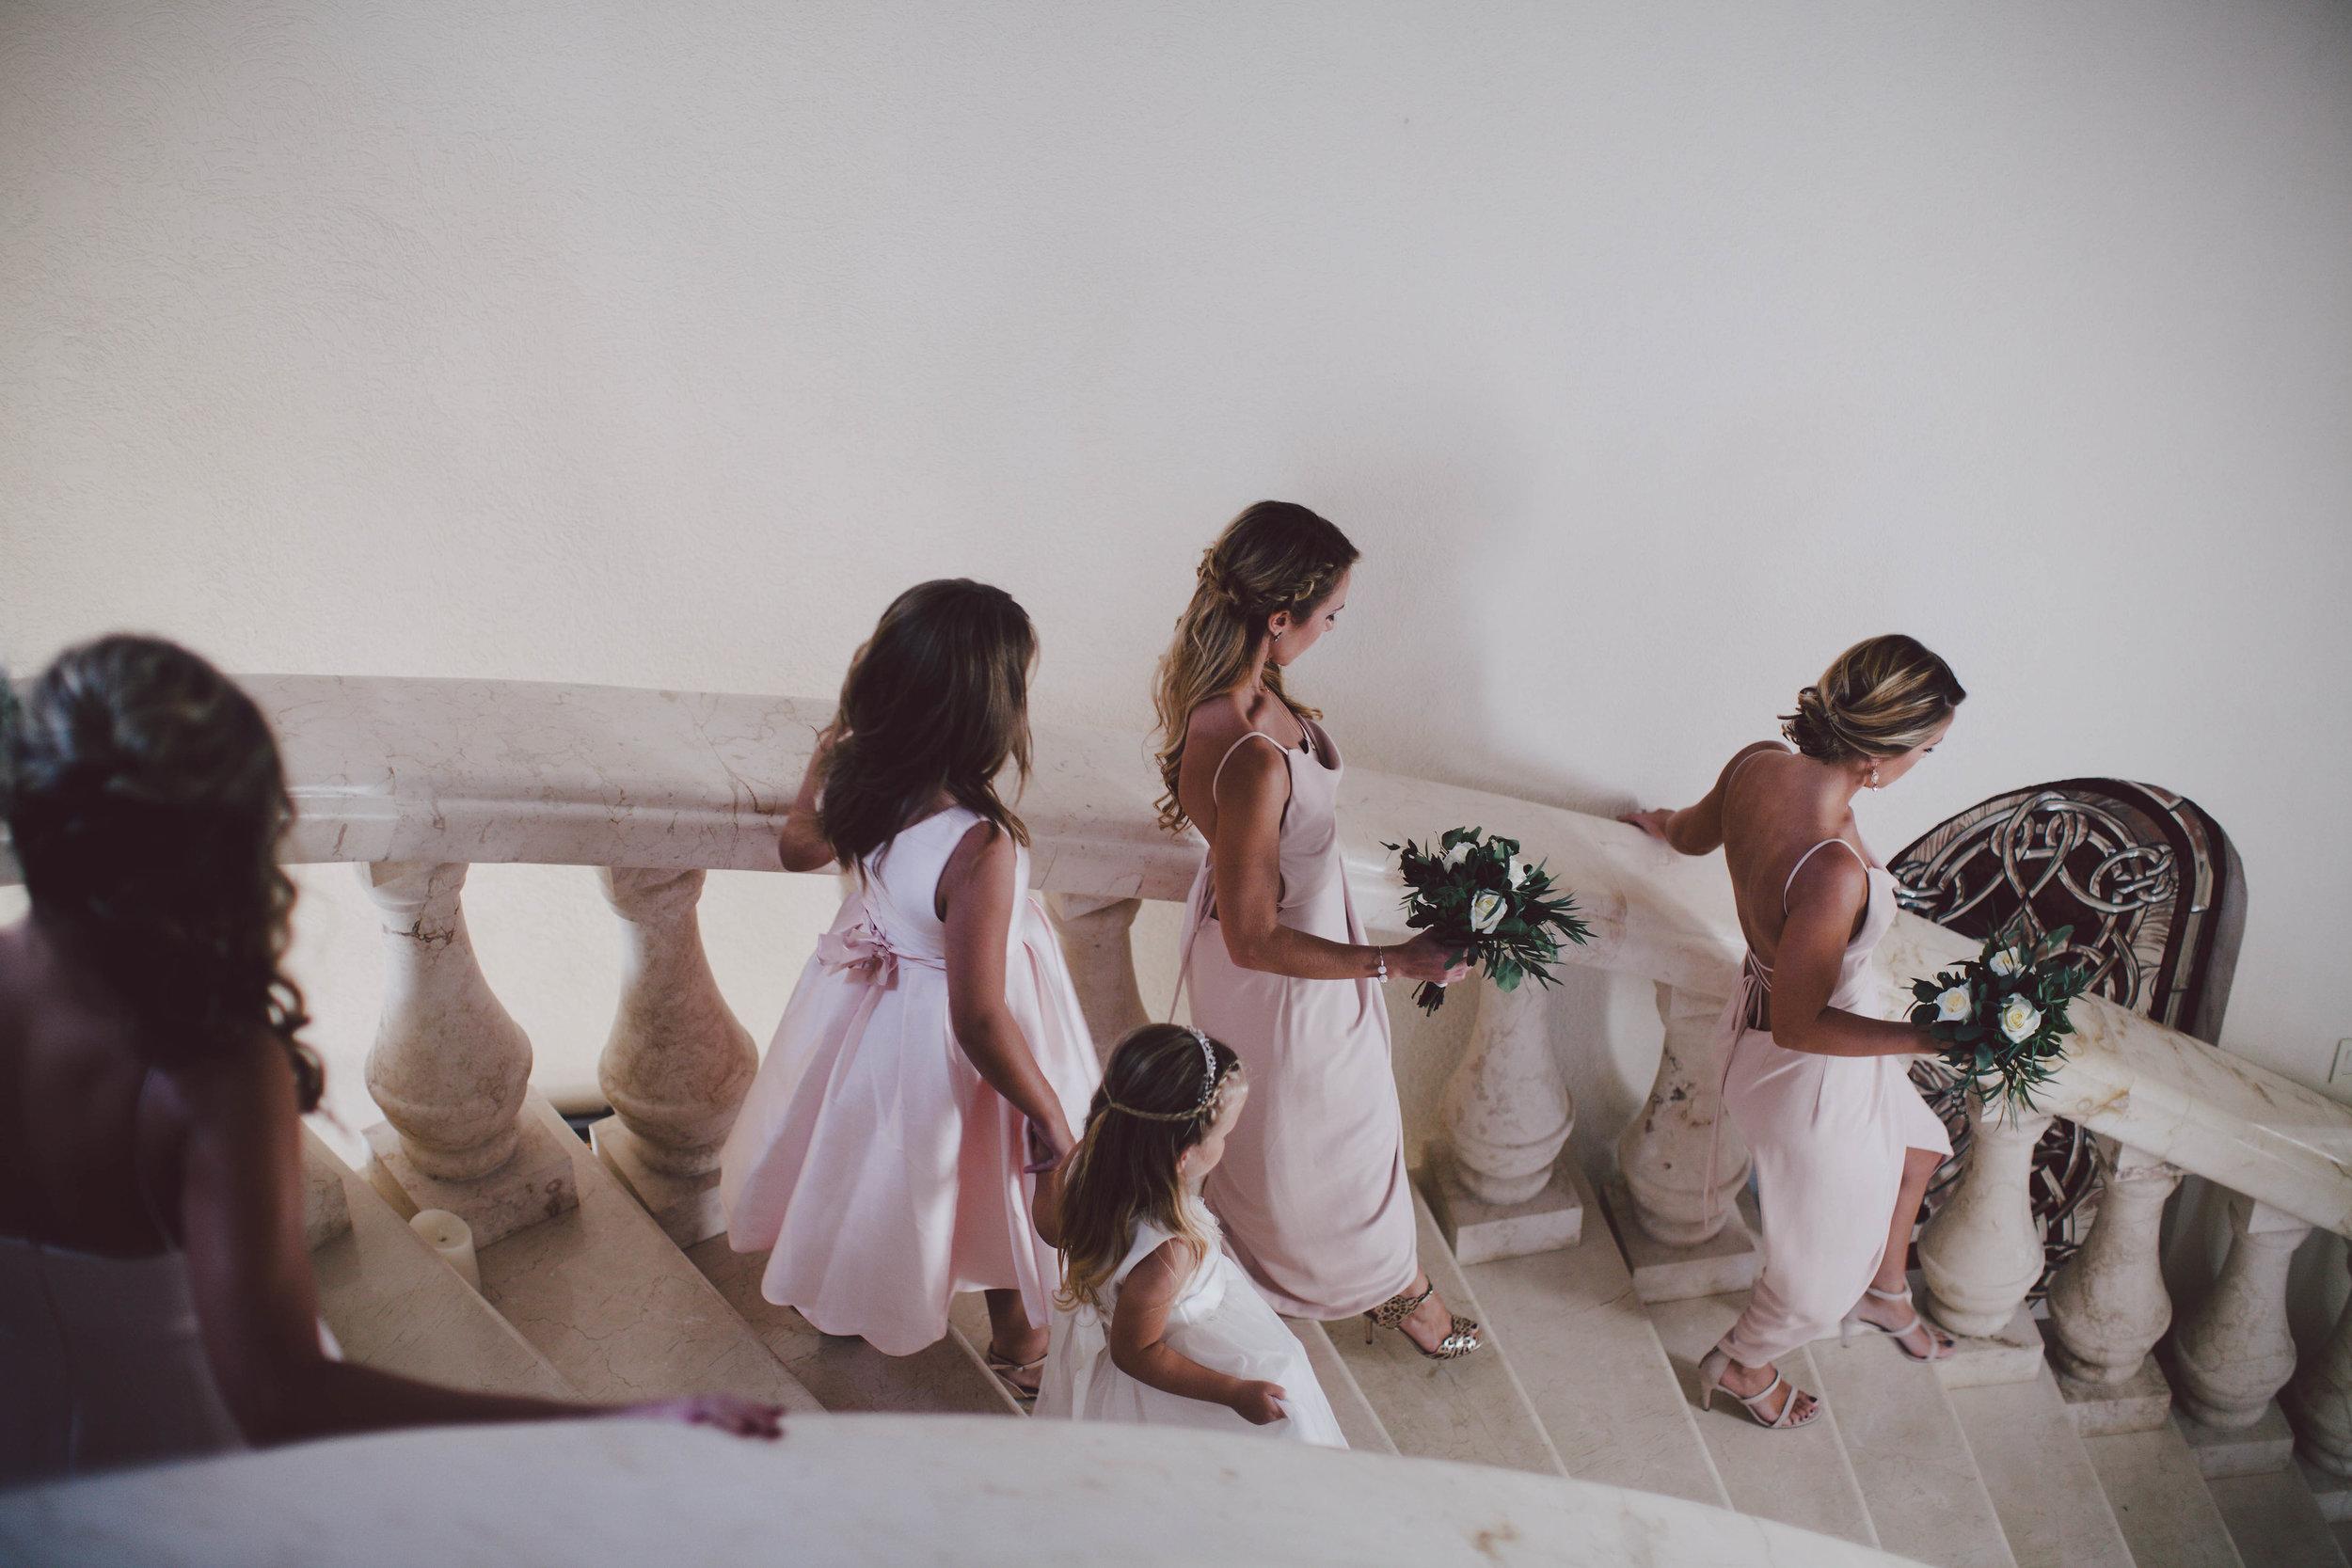 mexico_wedding_cancun_villa_la_joya_evangeline_lane_038.jpg